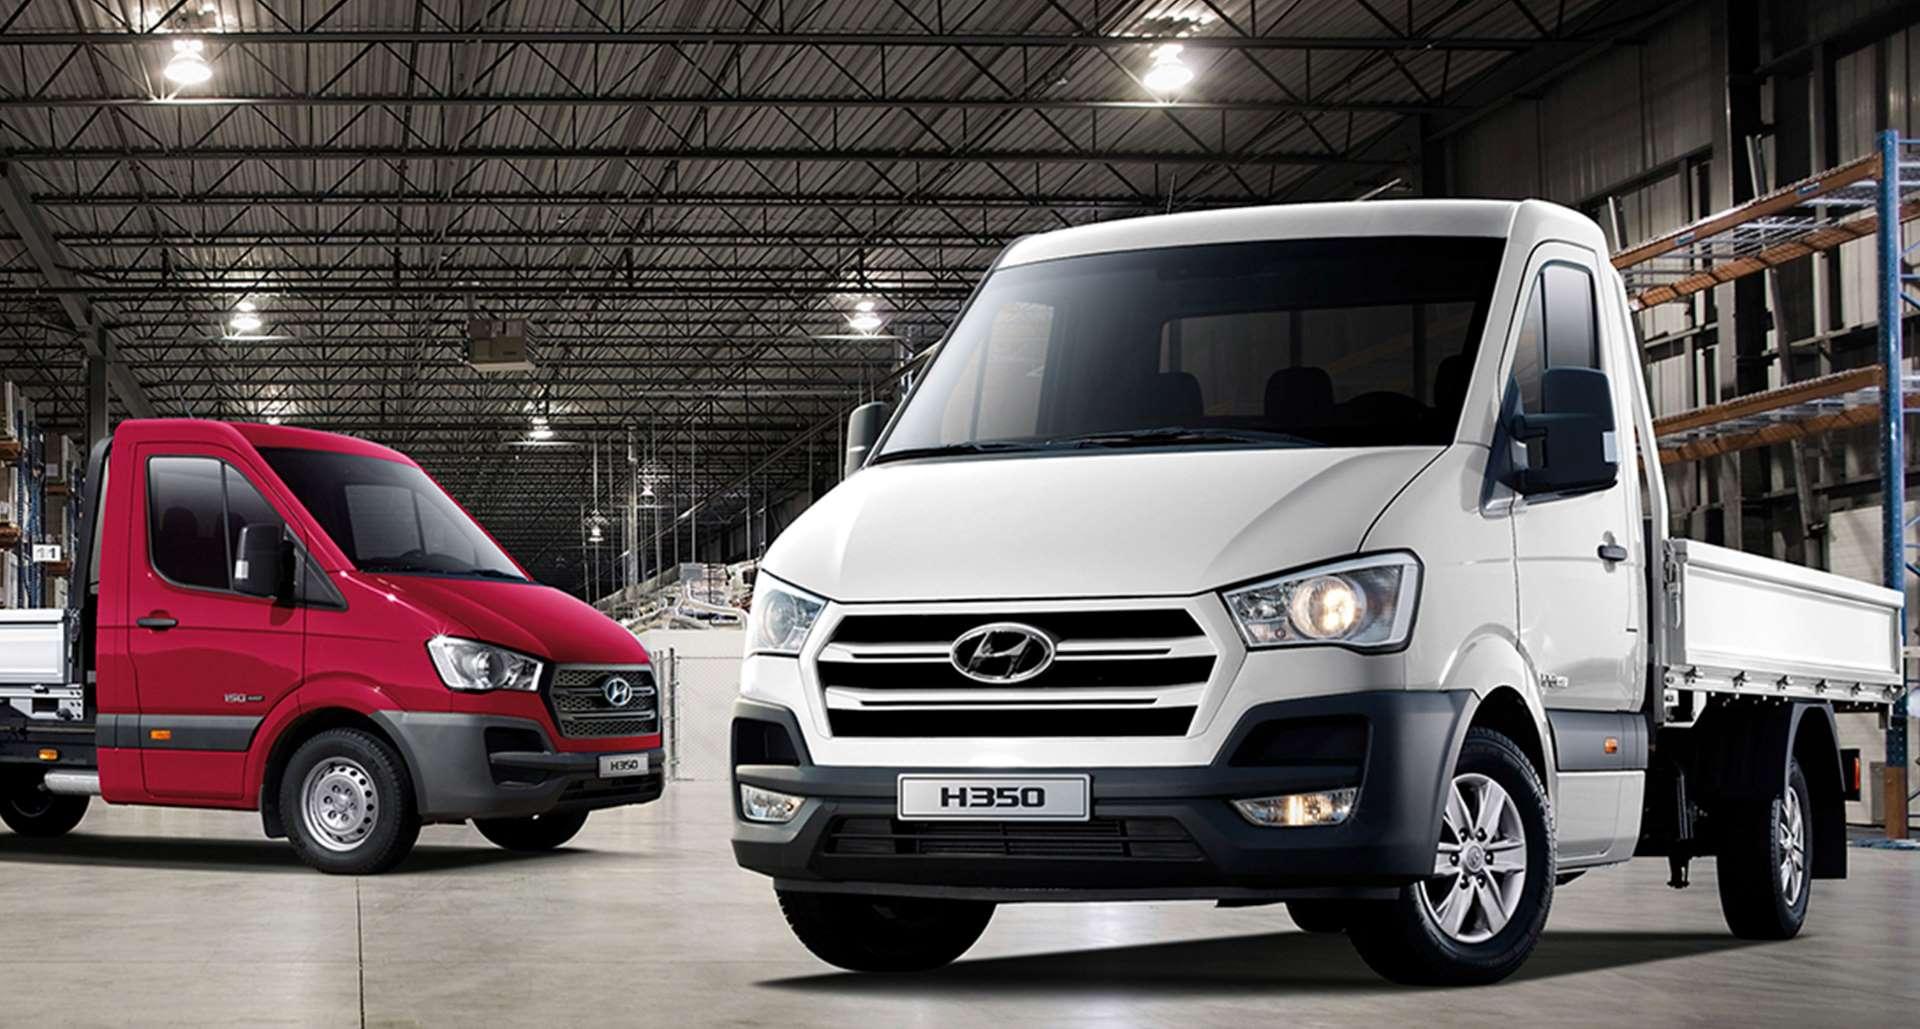 Hyundai H350 - характеристики